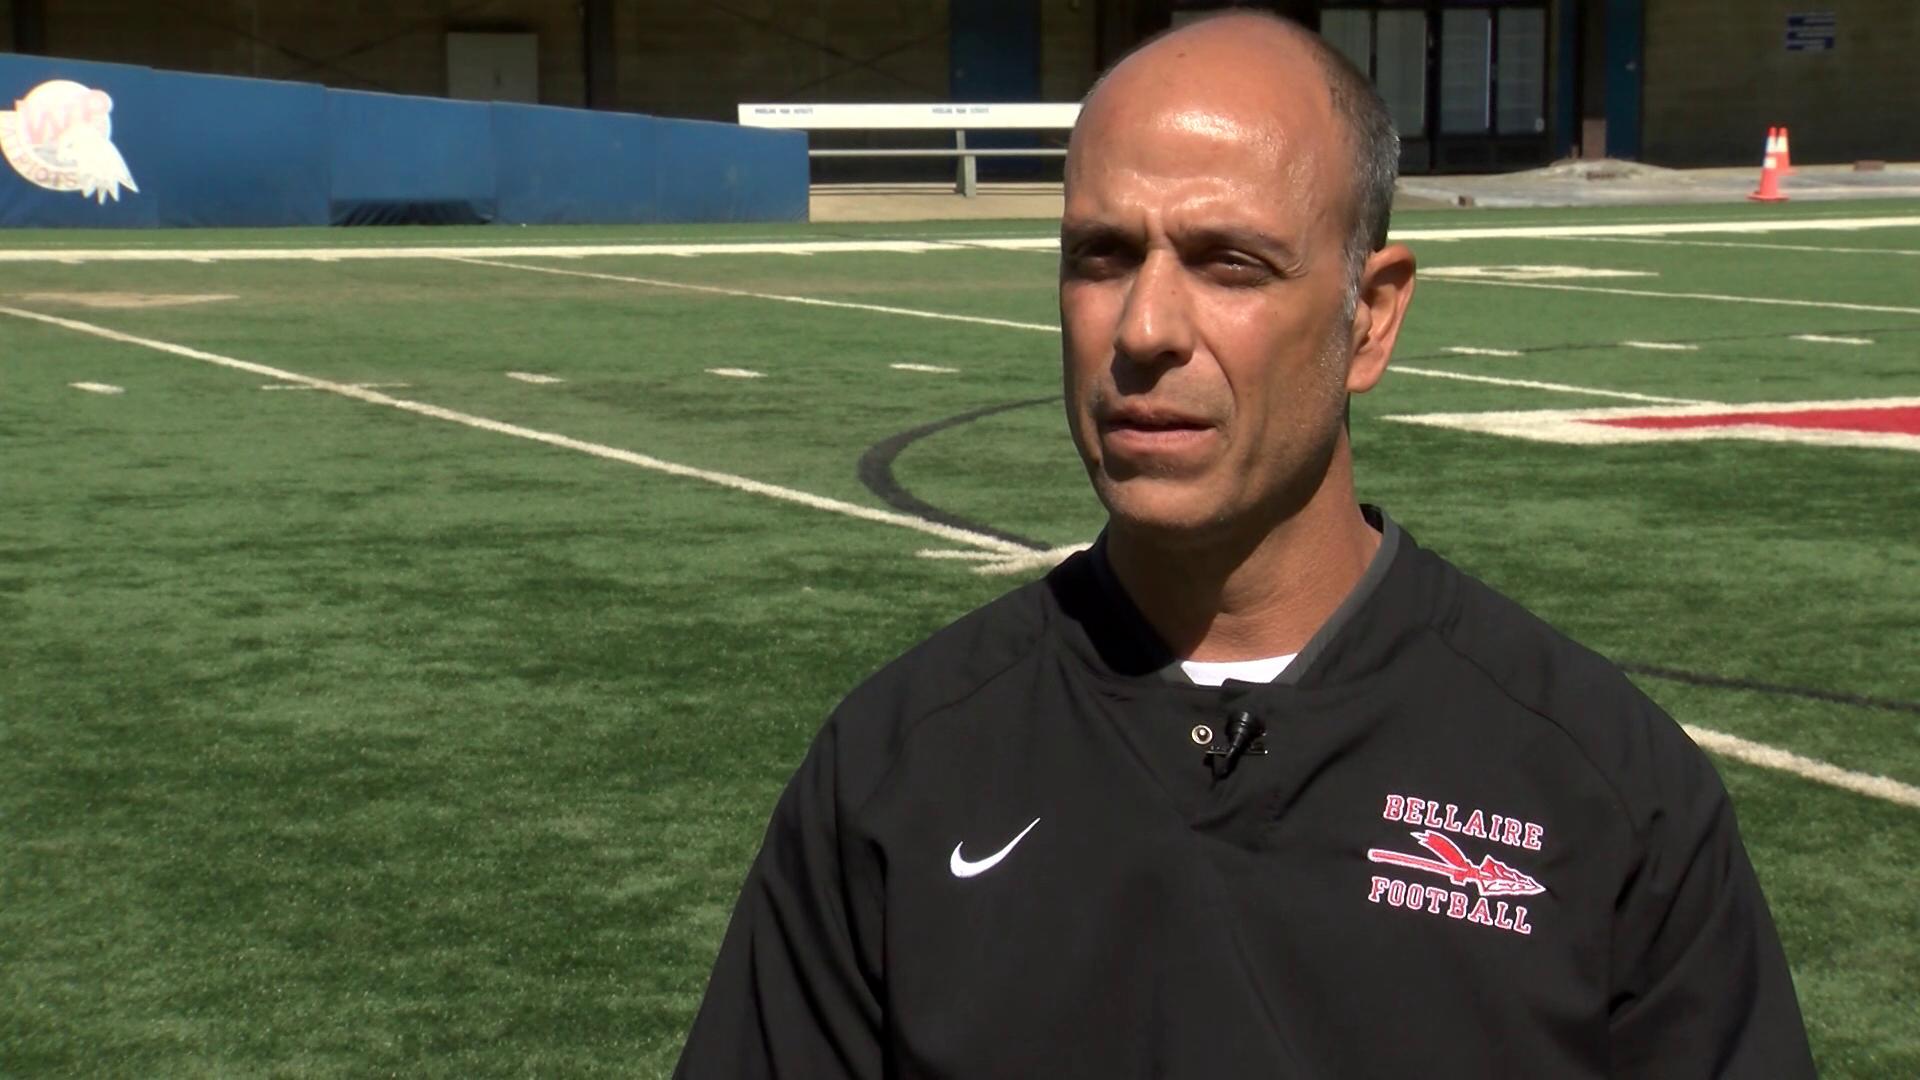 Coach Mark Spigarelli